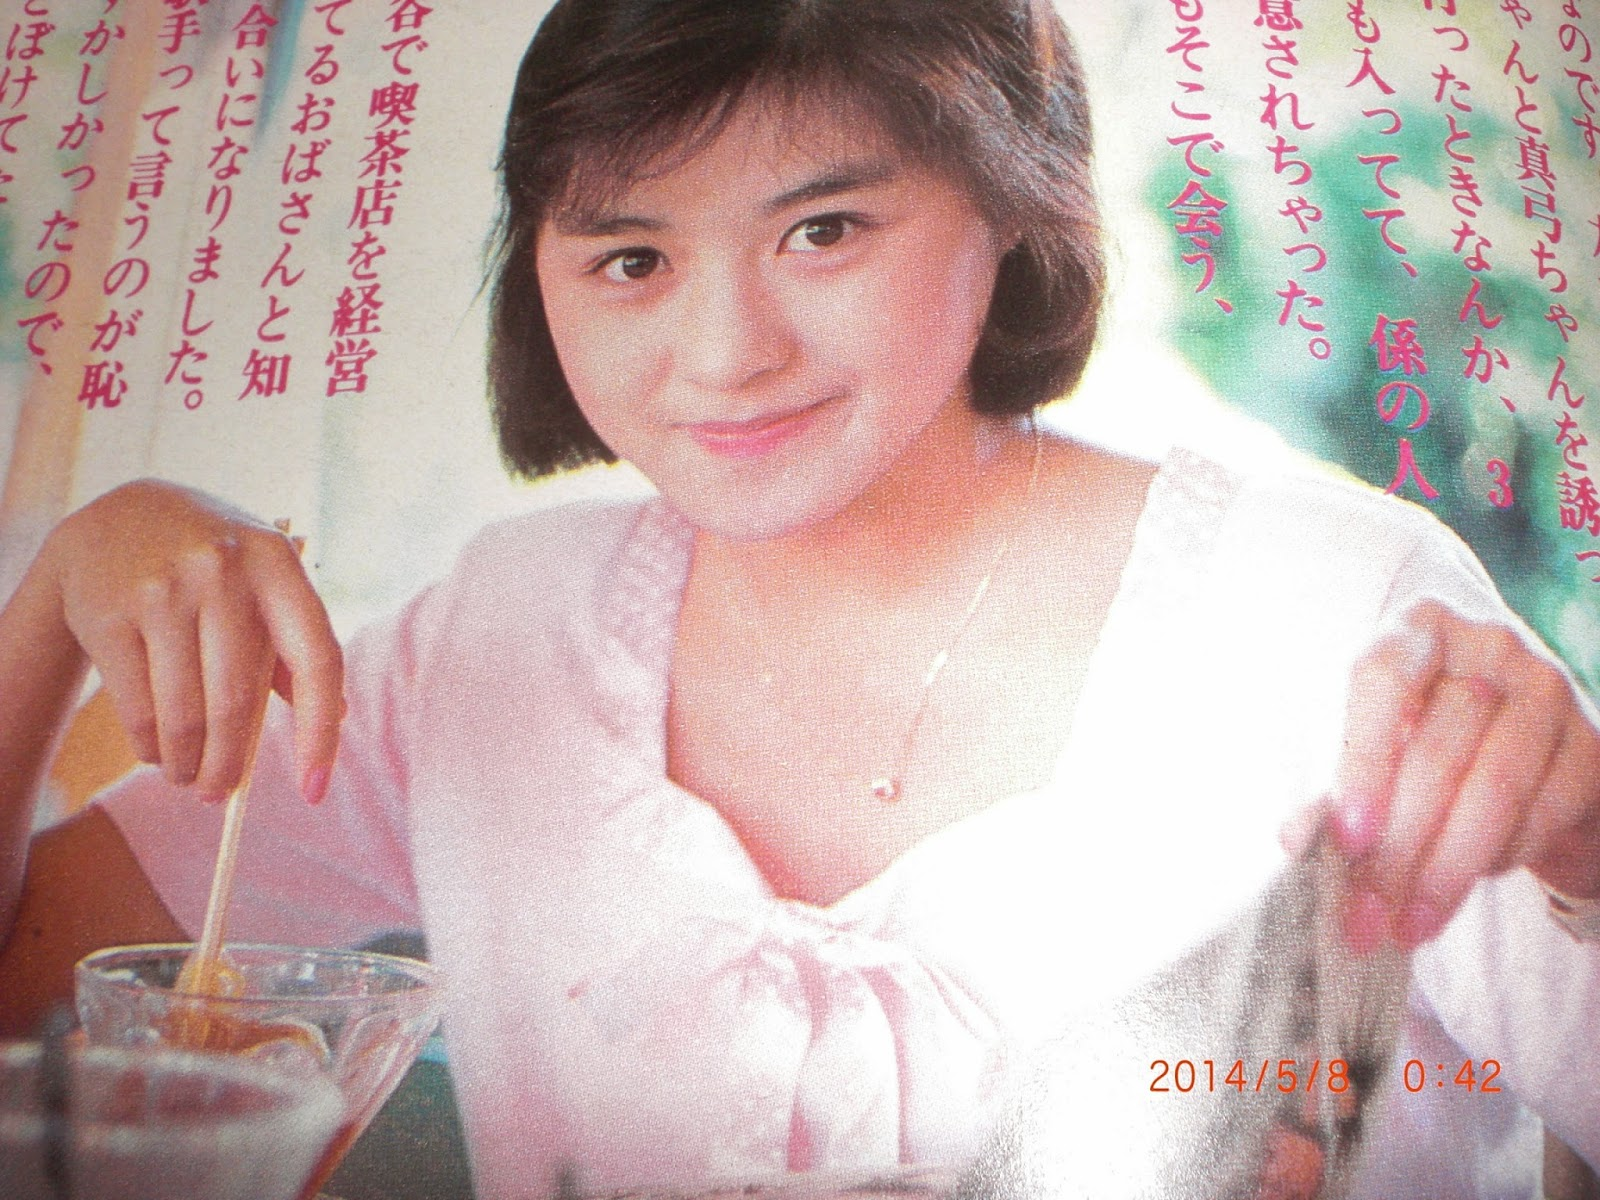 okazaki mature singles Jpop & music japanese | all singles single bang dream: hello, happy world - gouka goukai single taiiku okazaki - brat boy, brat girl single.